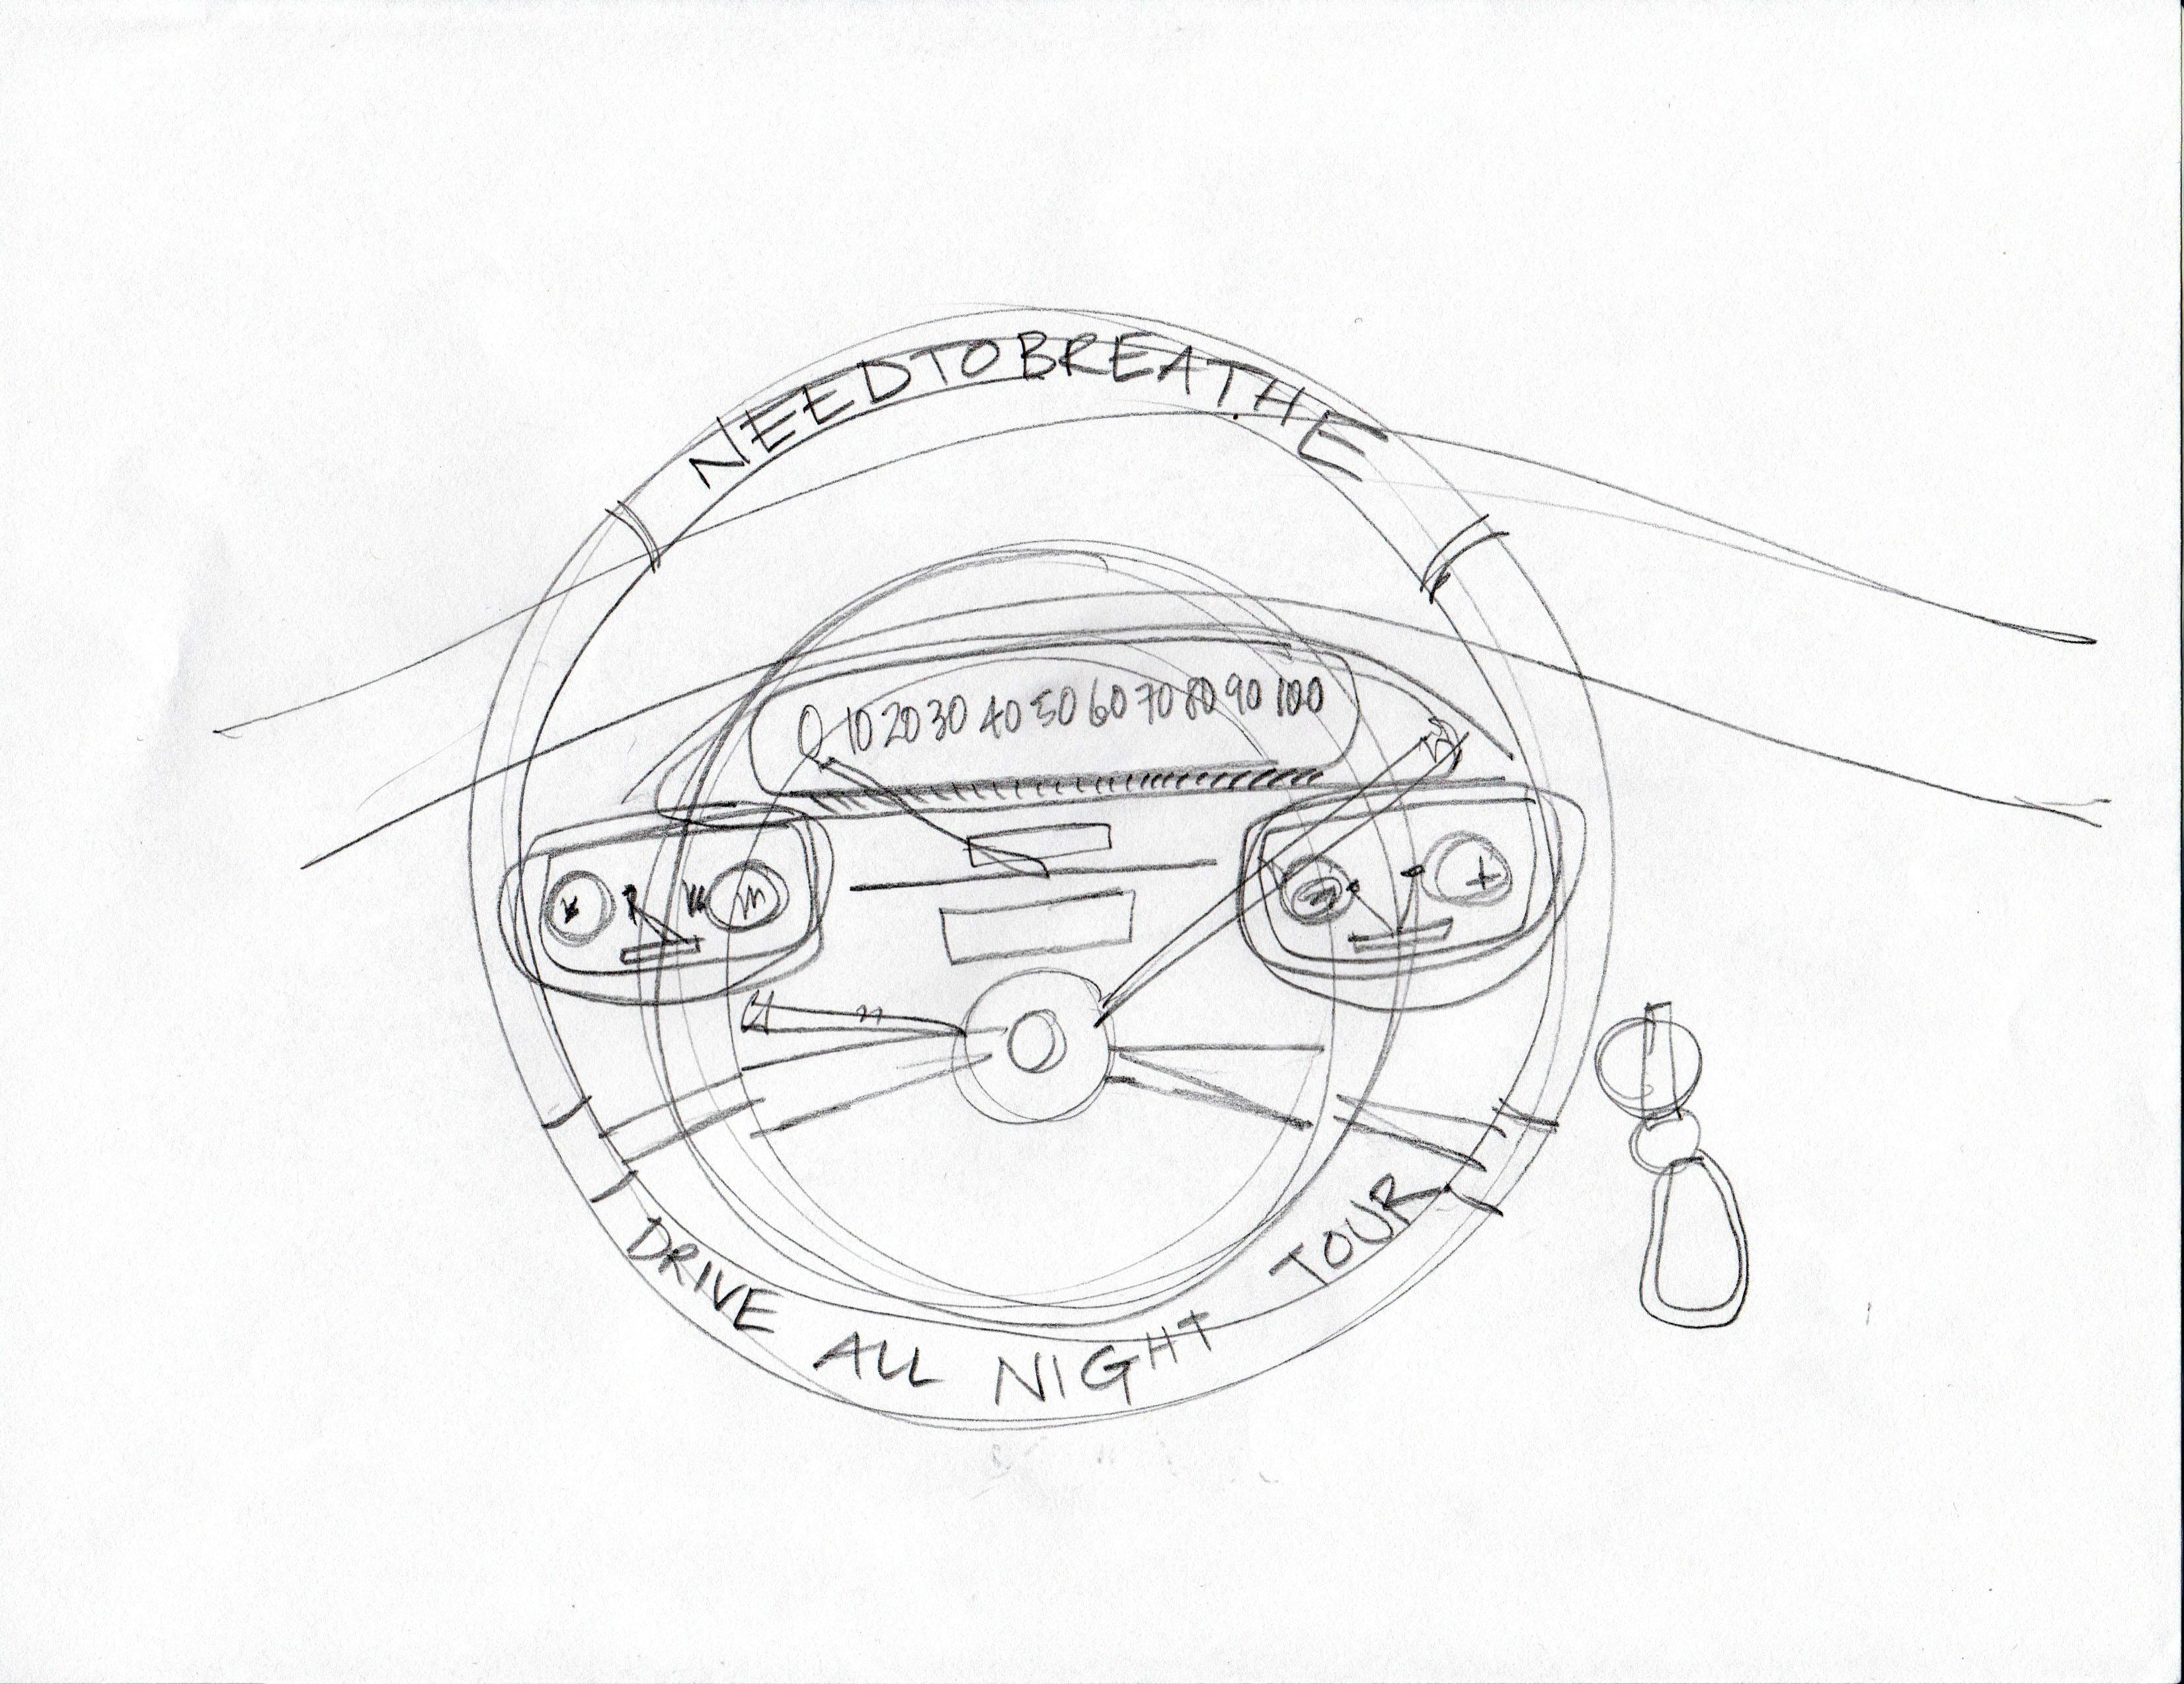 Needtobreathe - image 6 - student project